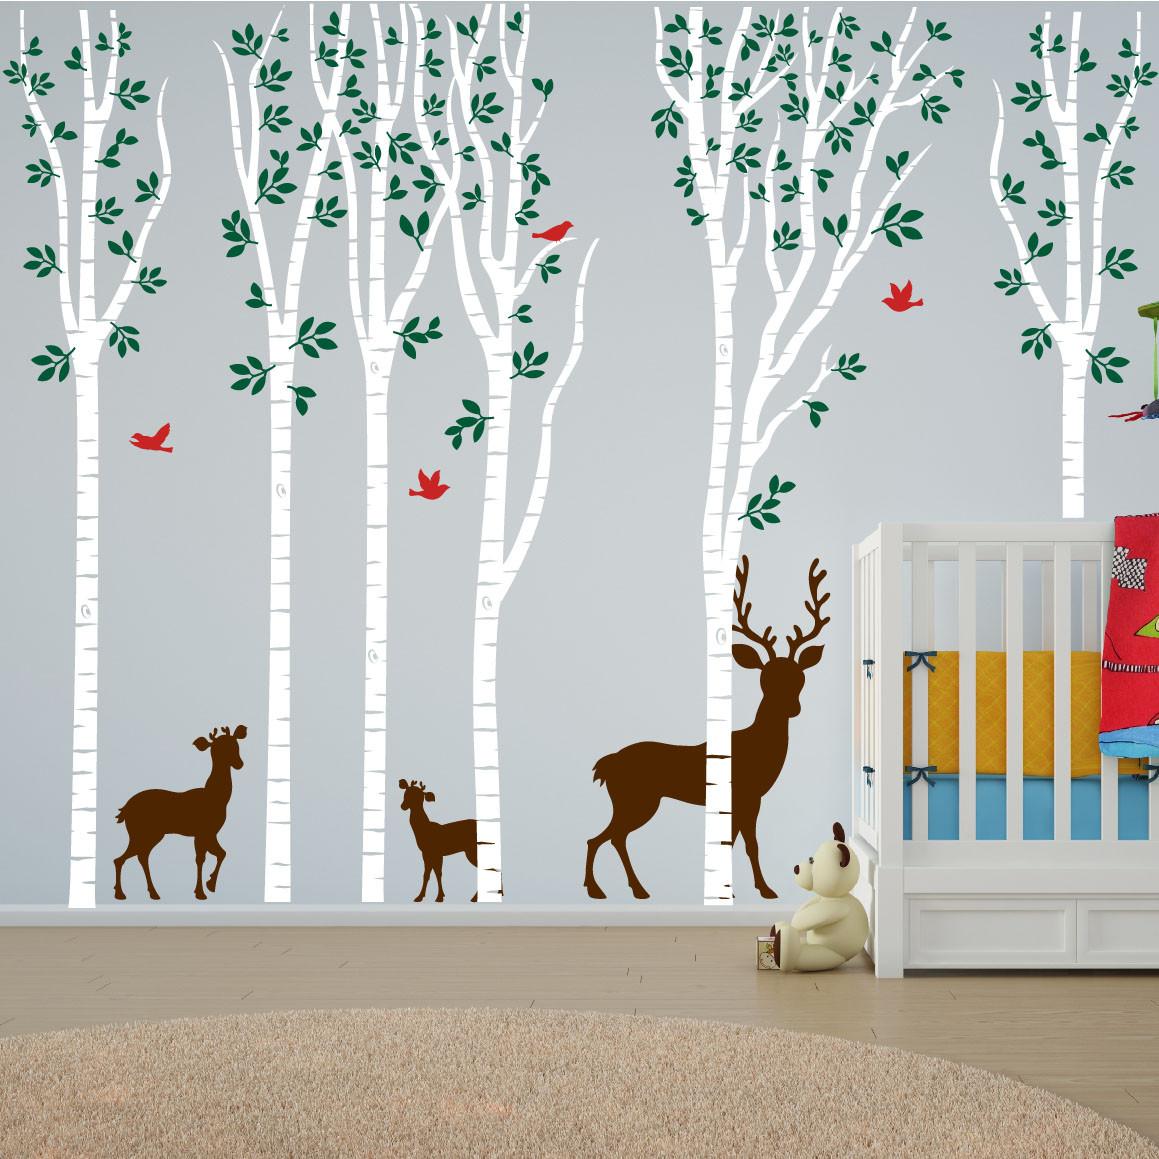 Birch tree forest set vinyl nursery wall decal deer 1264 for Deer wall mural